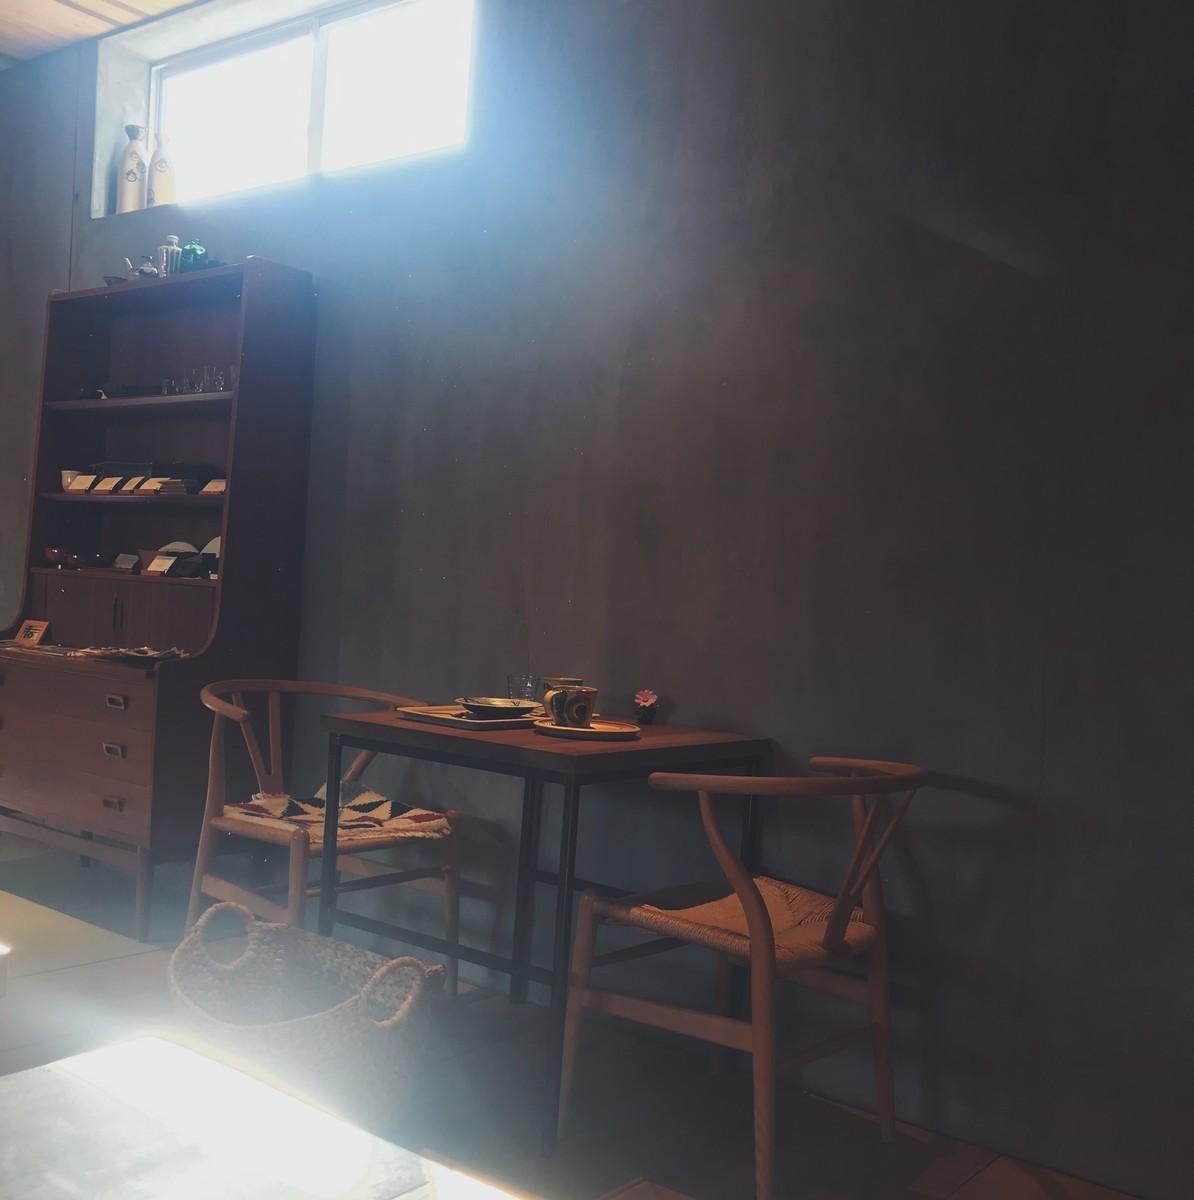 f:id:asacafe:20201114000727j:plain